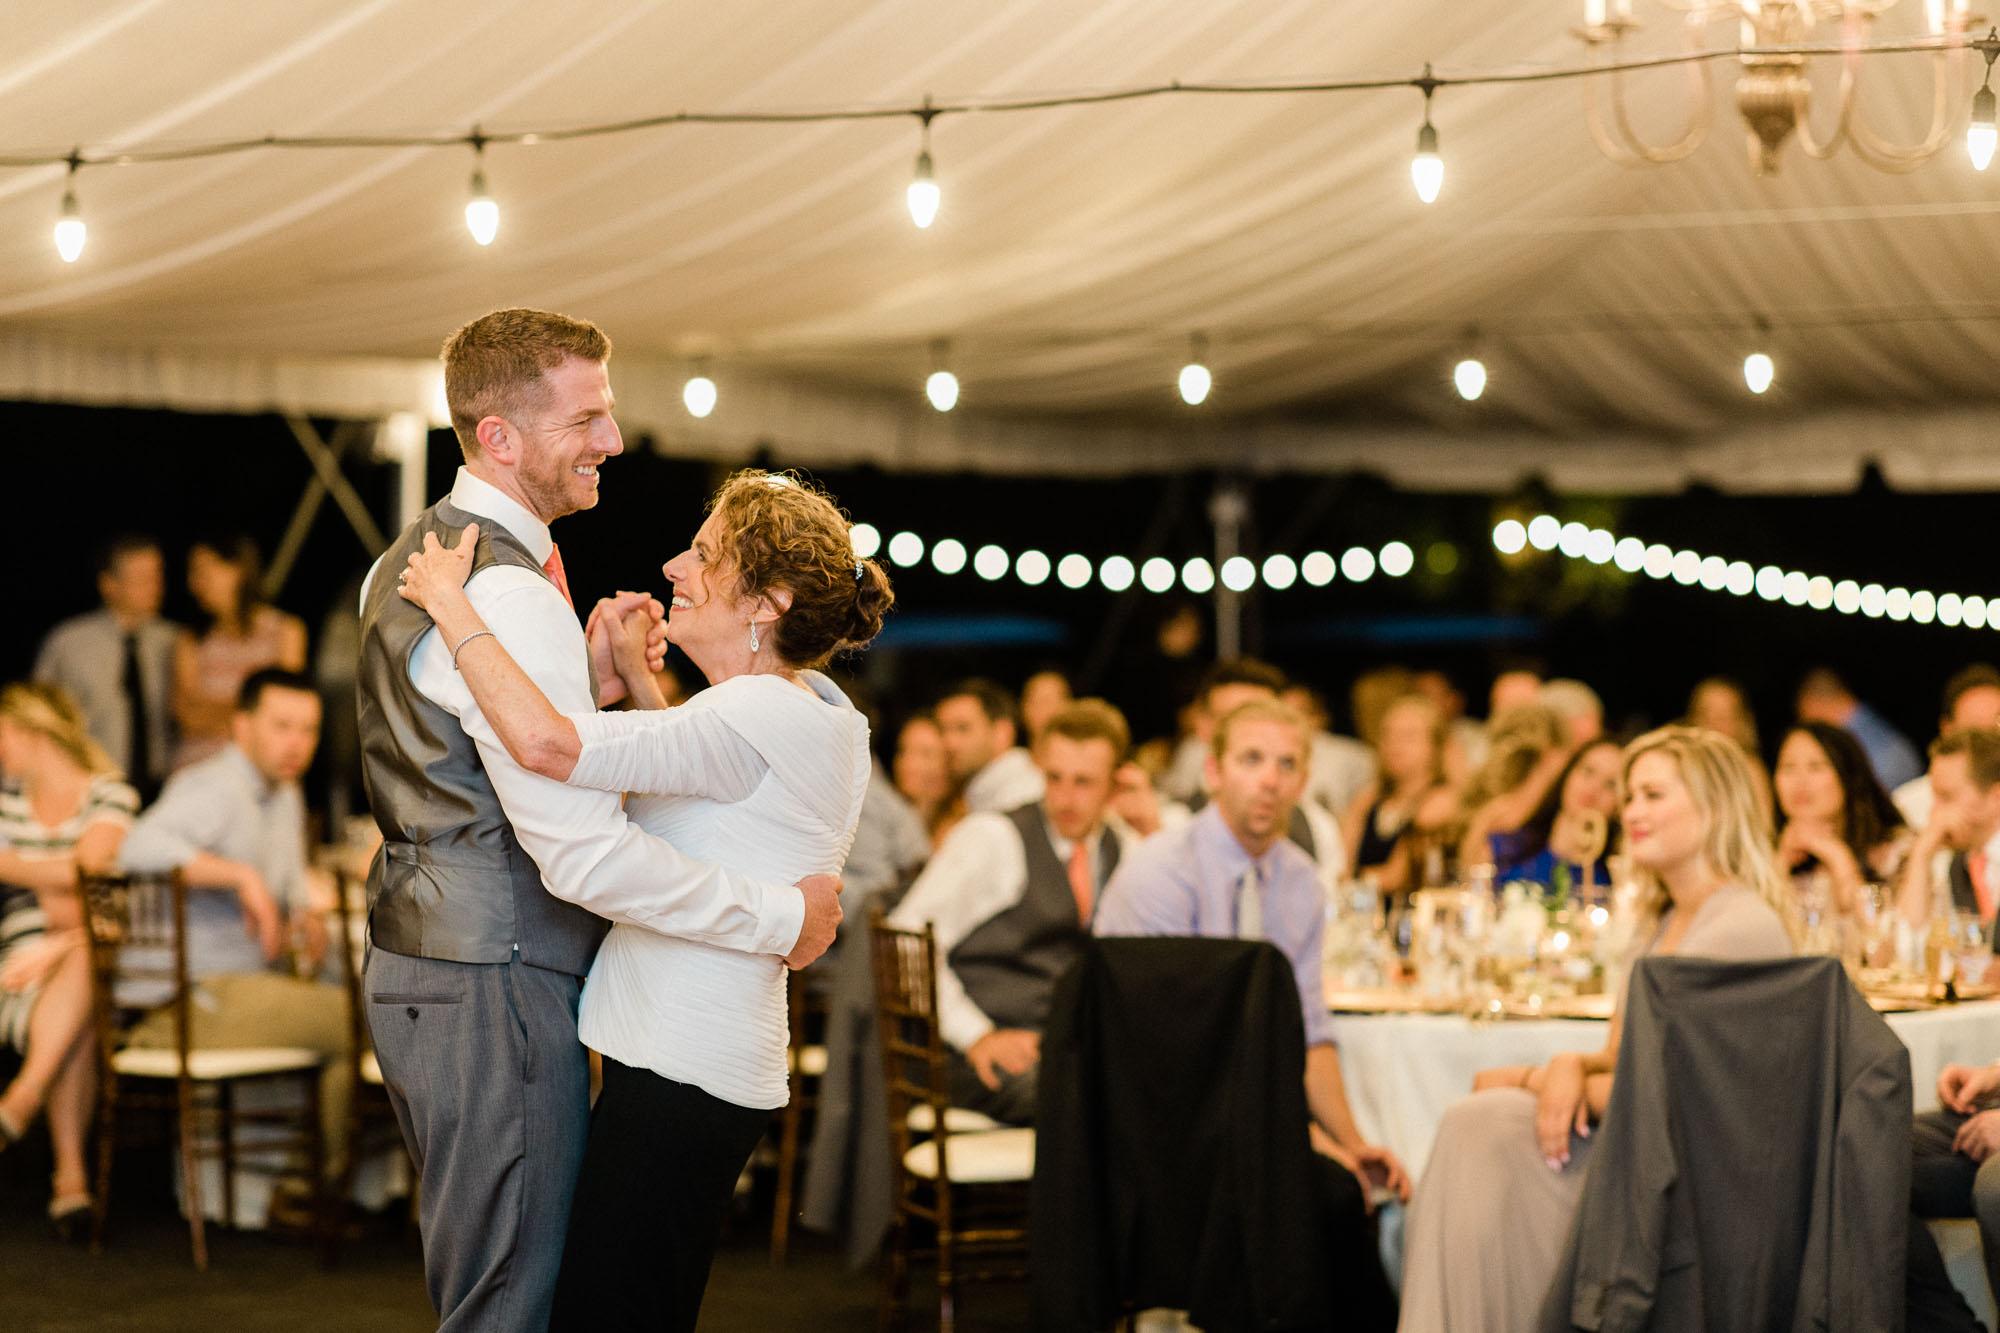 Allenberry-resort-historic-pennsylvania-wedding-22585.jpg